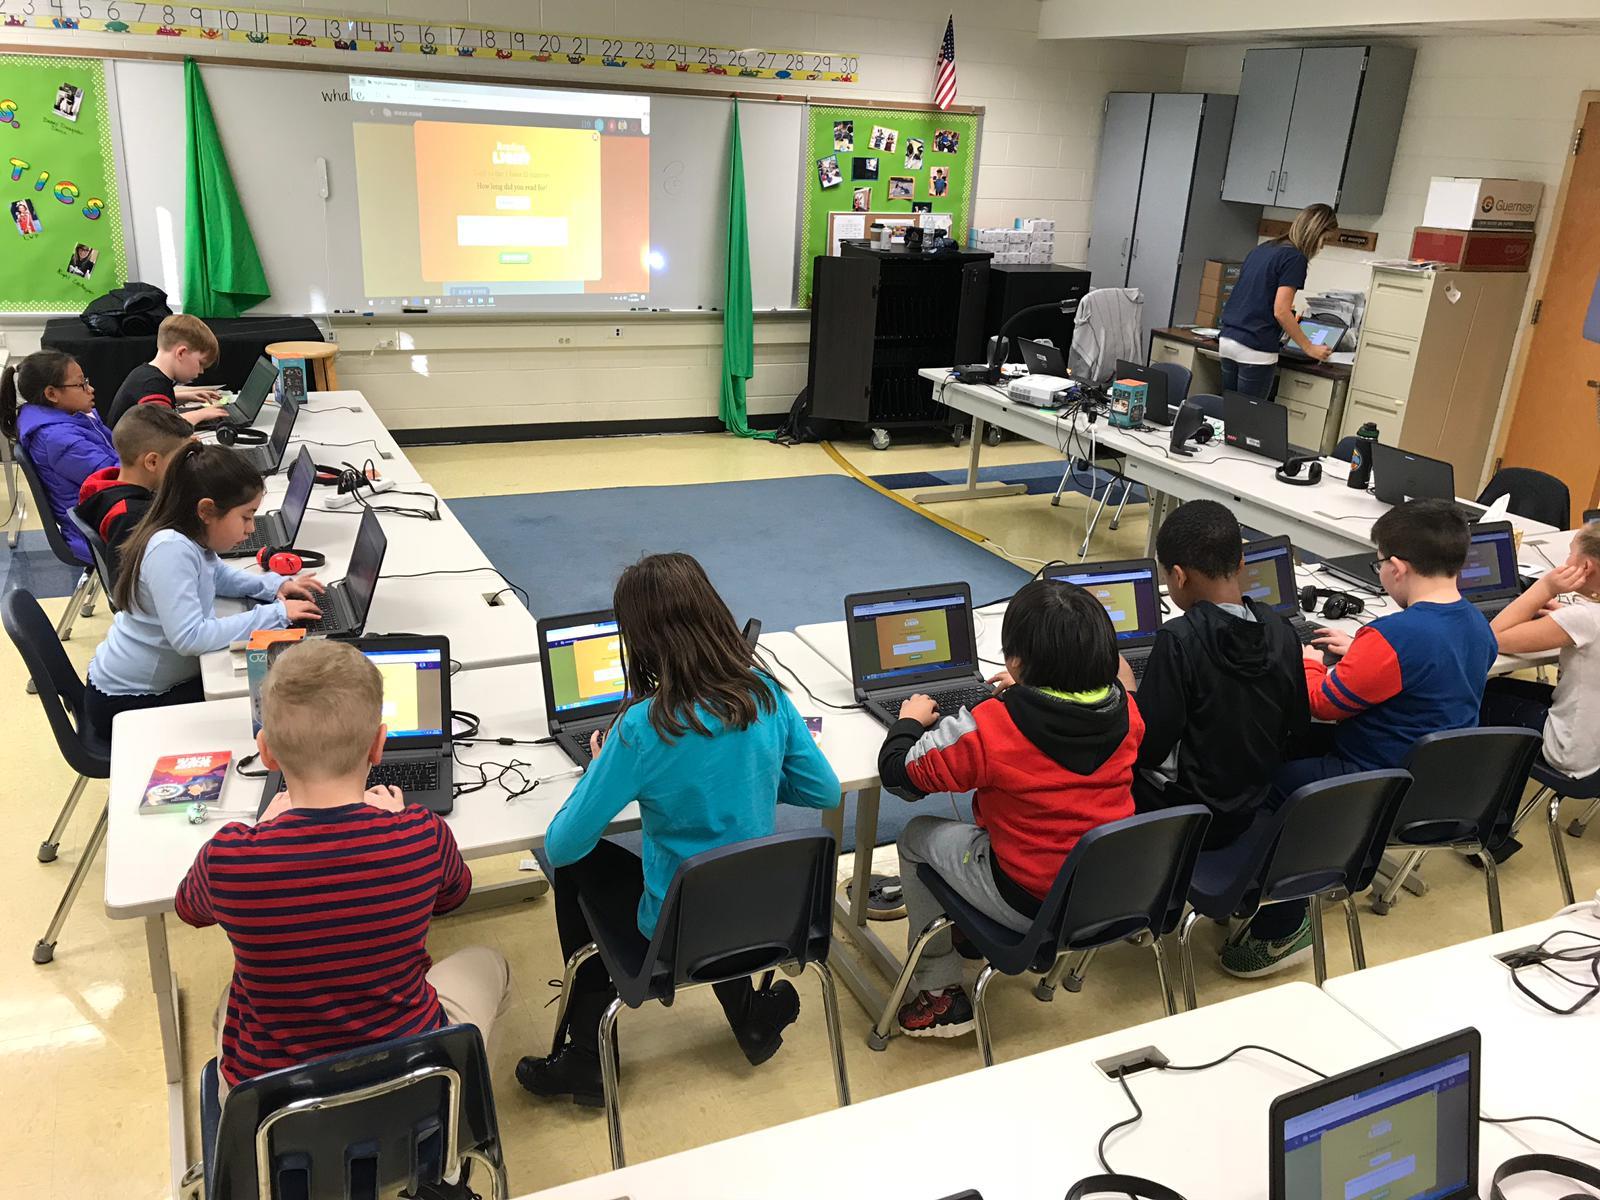 Students in US classroom 1.jpeg